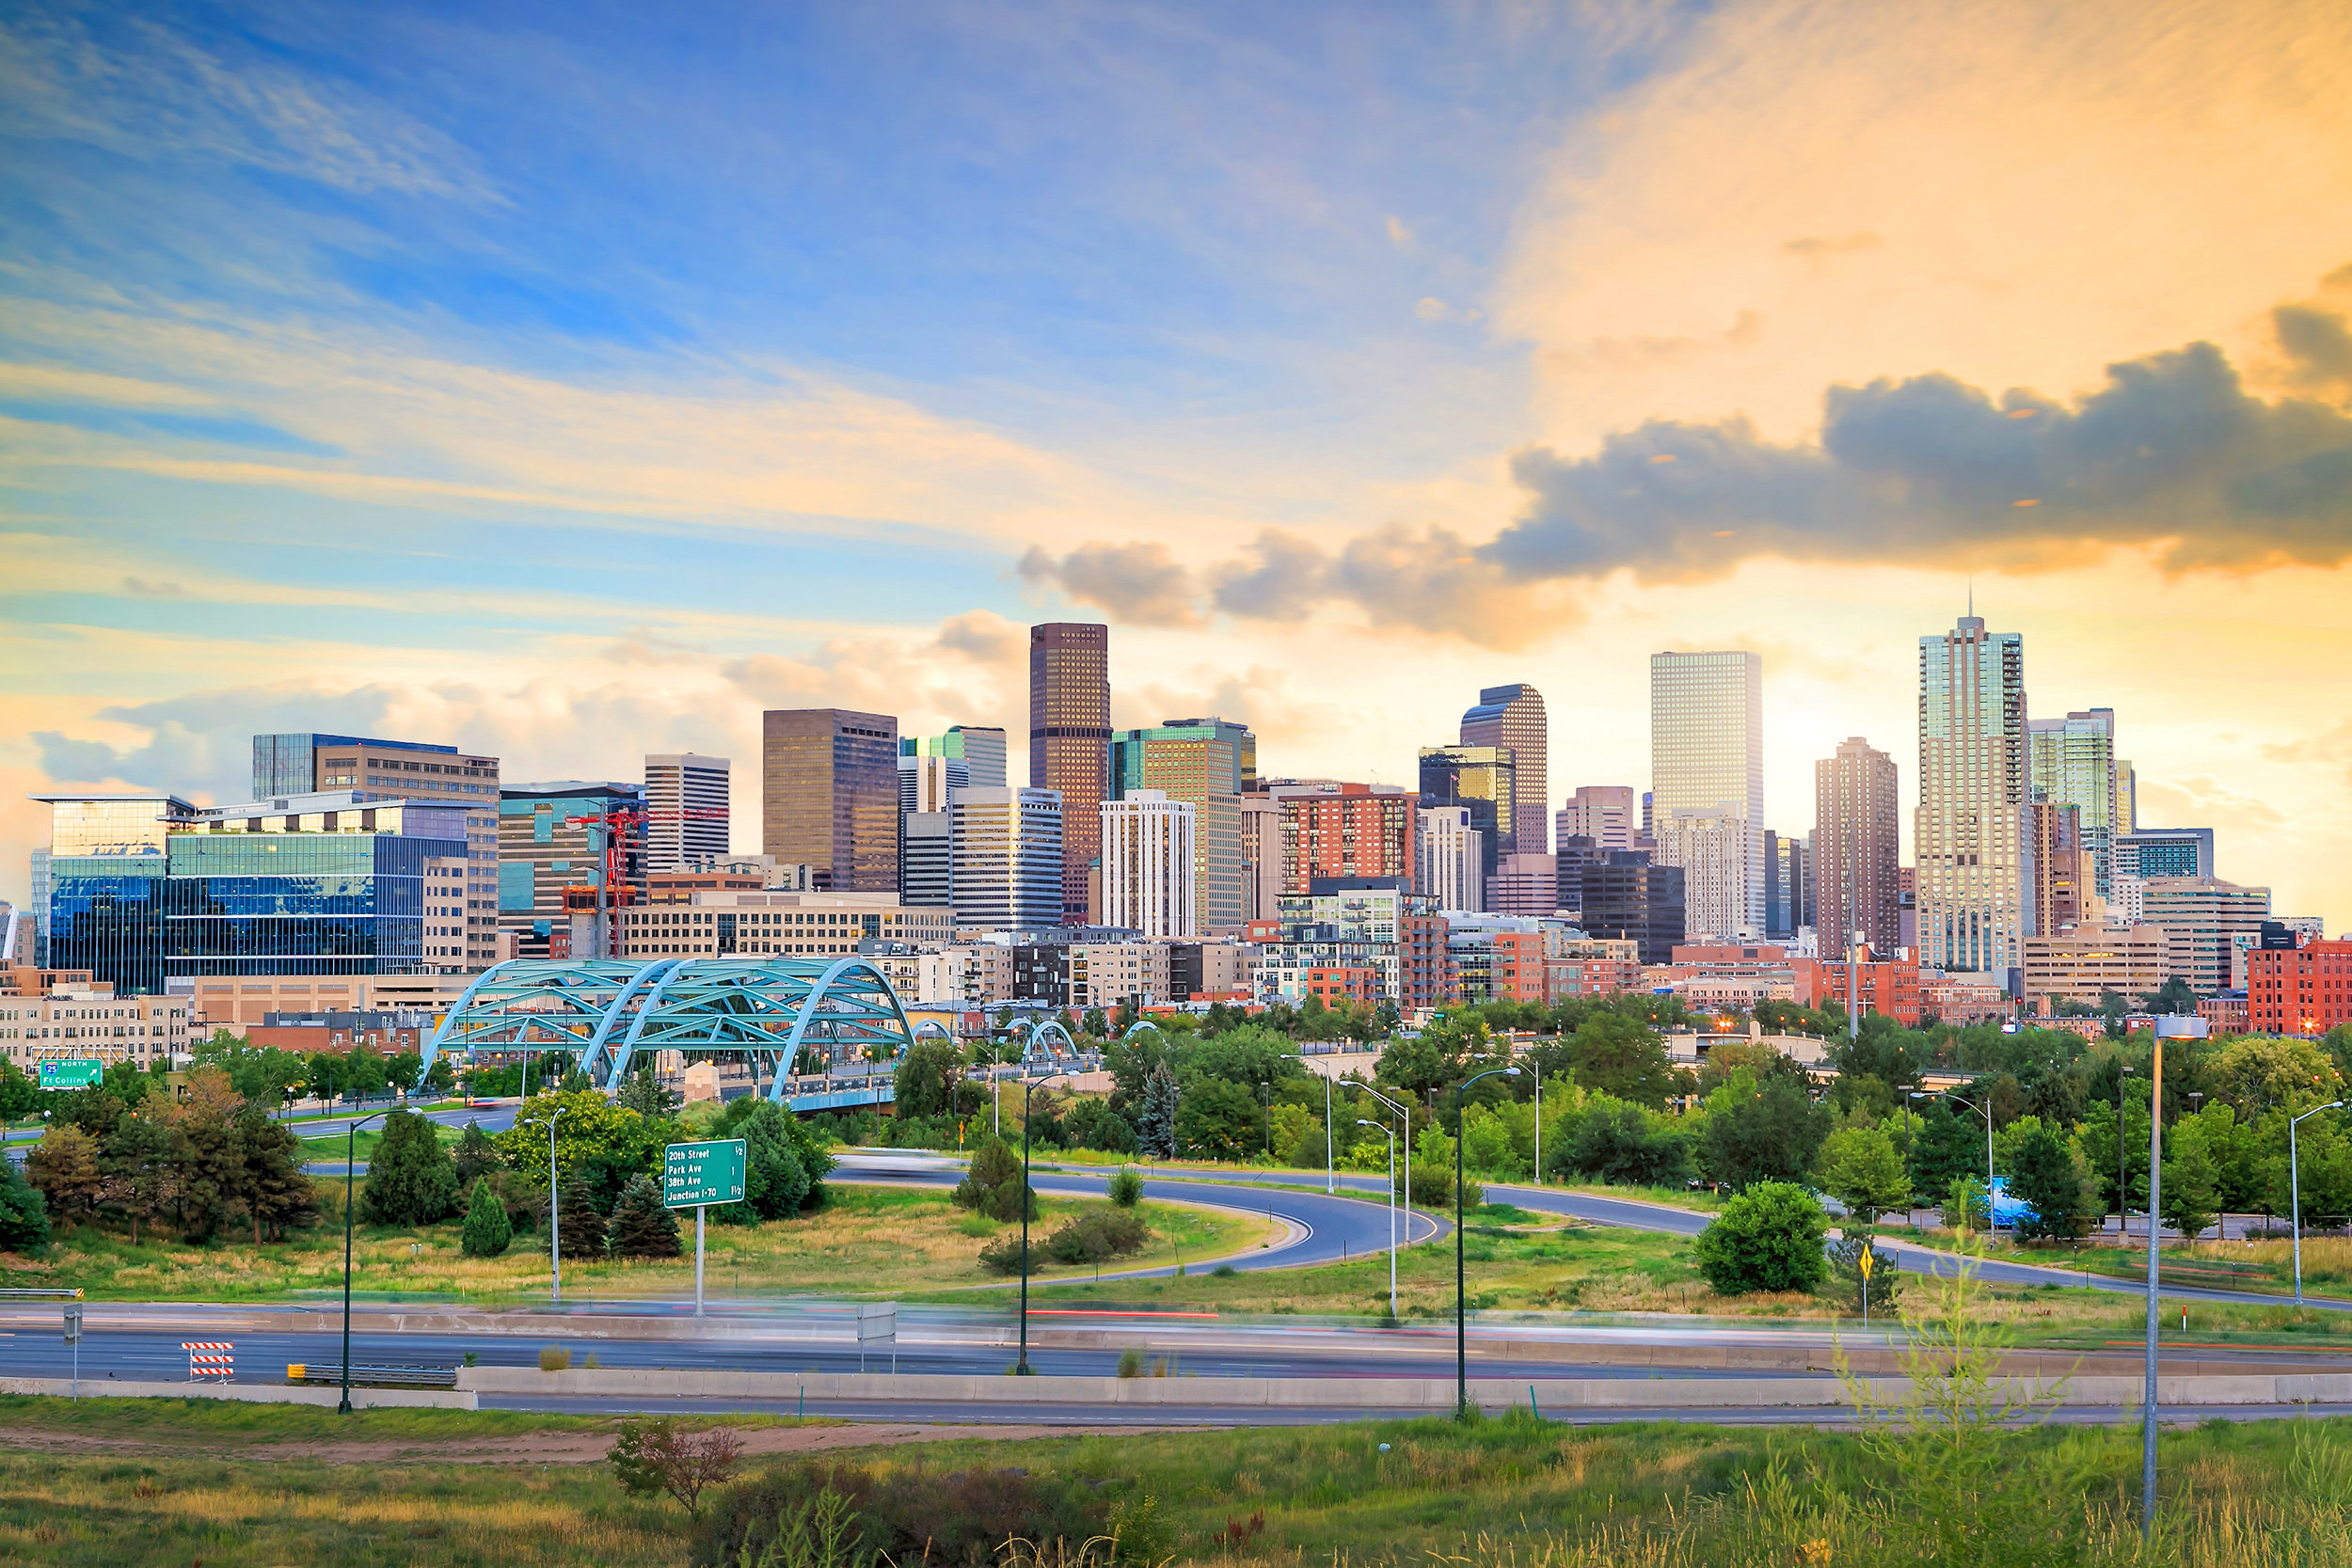 DenverSkyline_Sunset_02.jpg